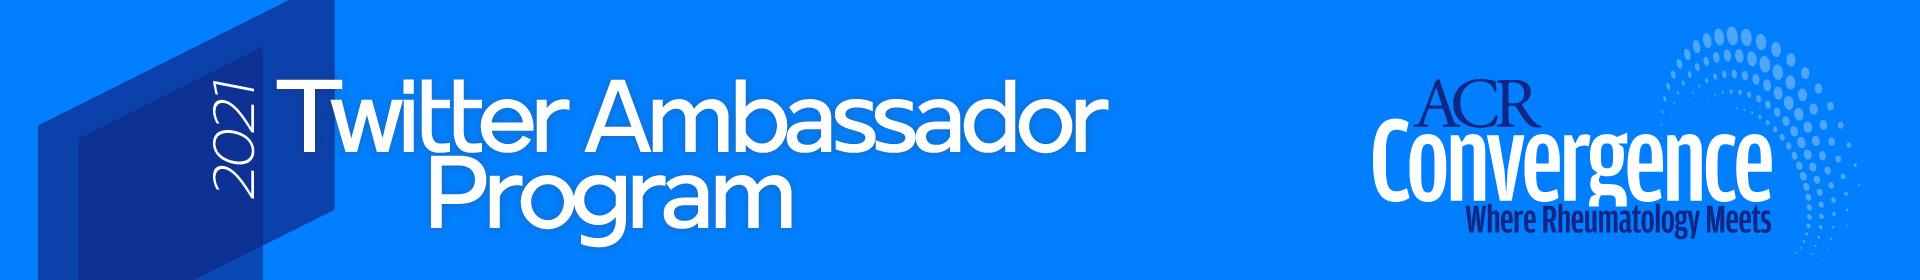 Twitter Ambassador Program